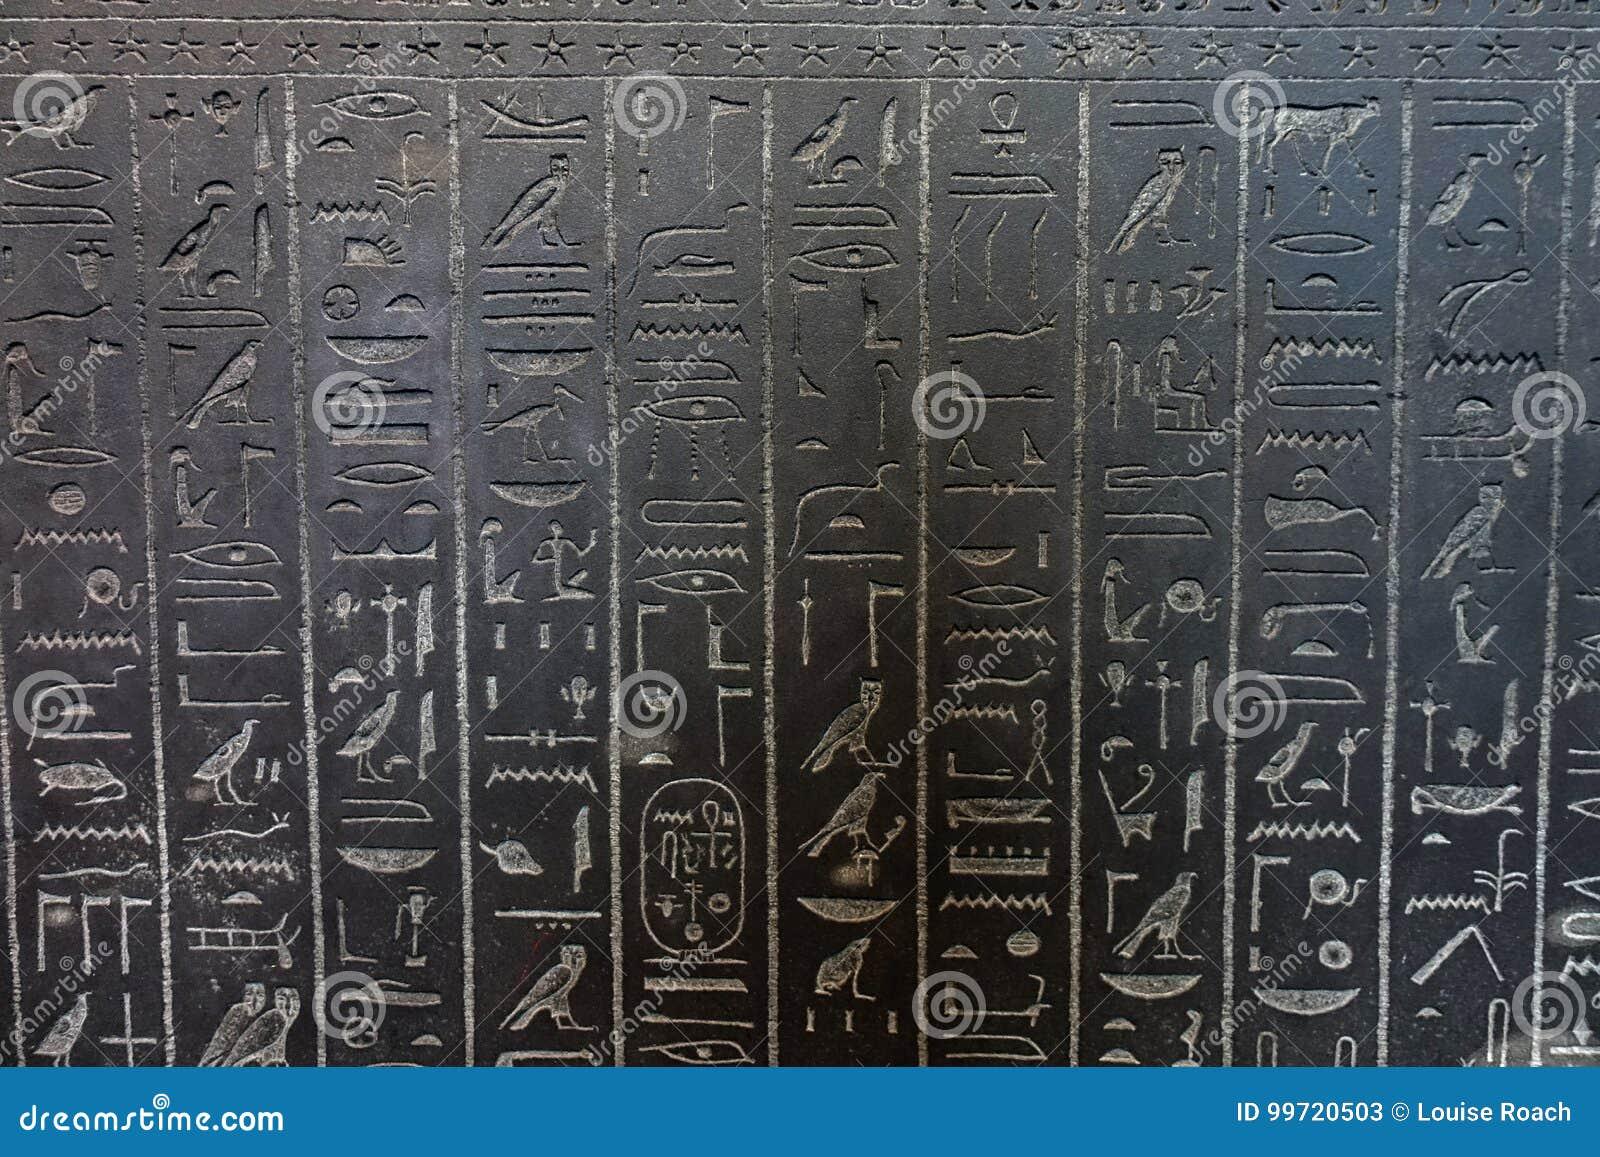 Hieroglyphics Close-Up